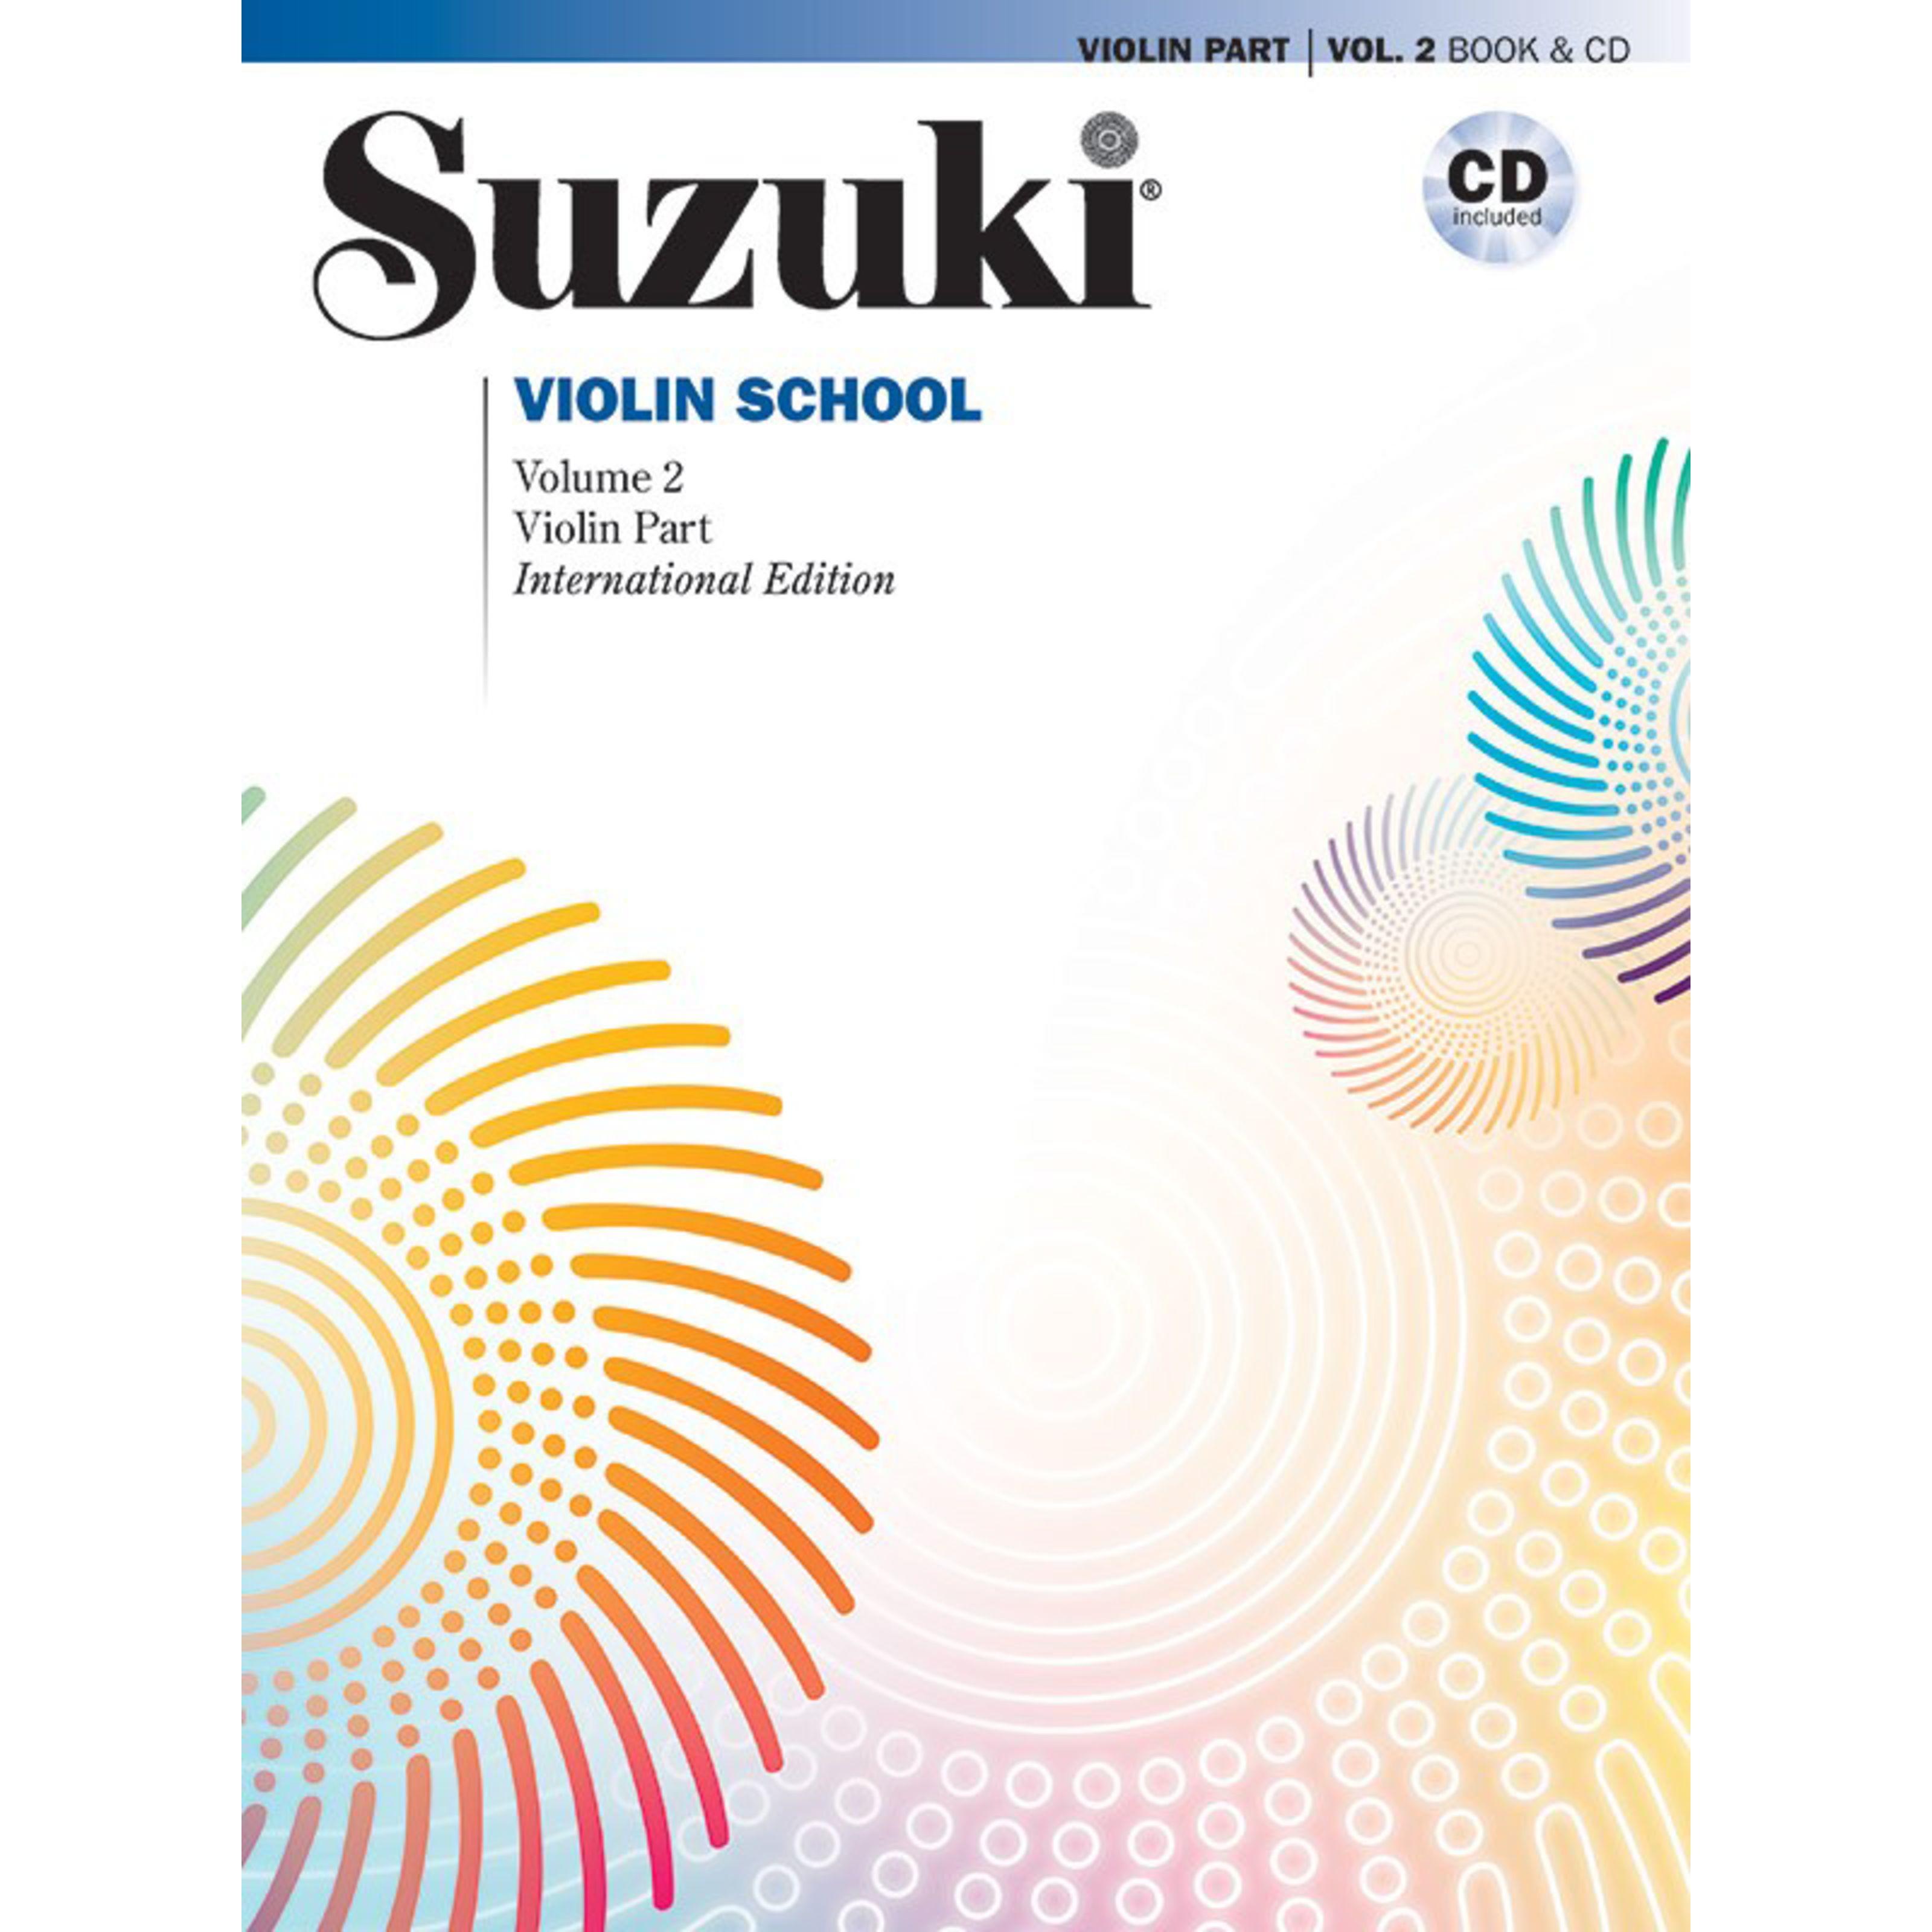 Alfred Music - Suzuki Violin School 2 00-48725